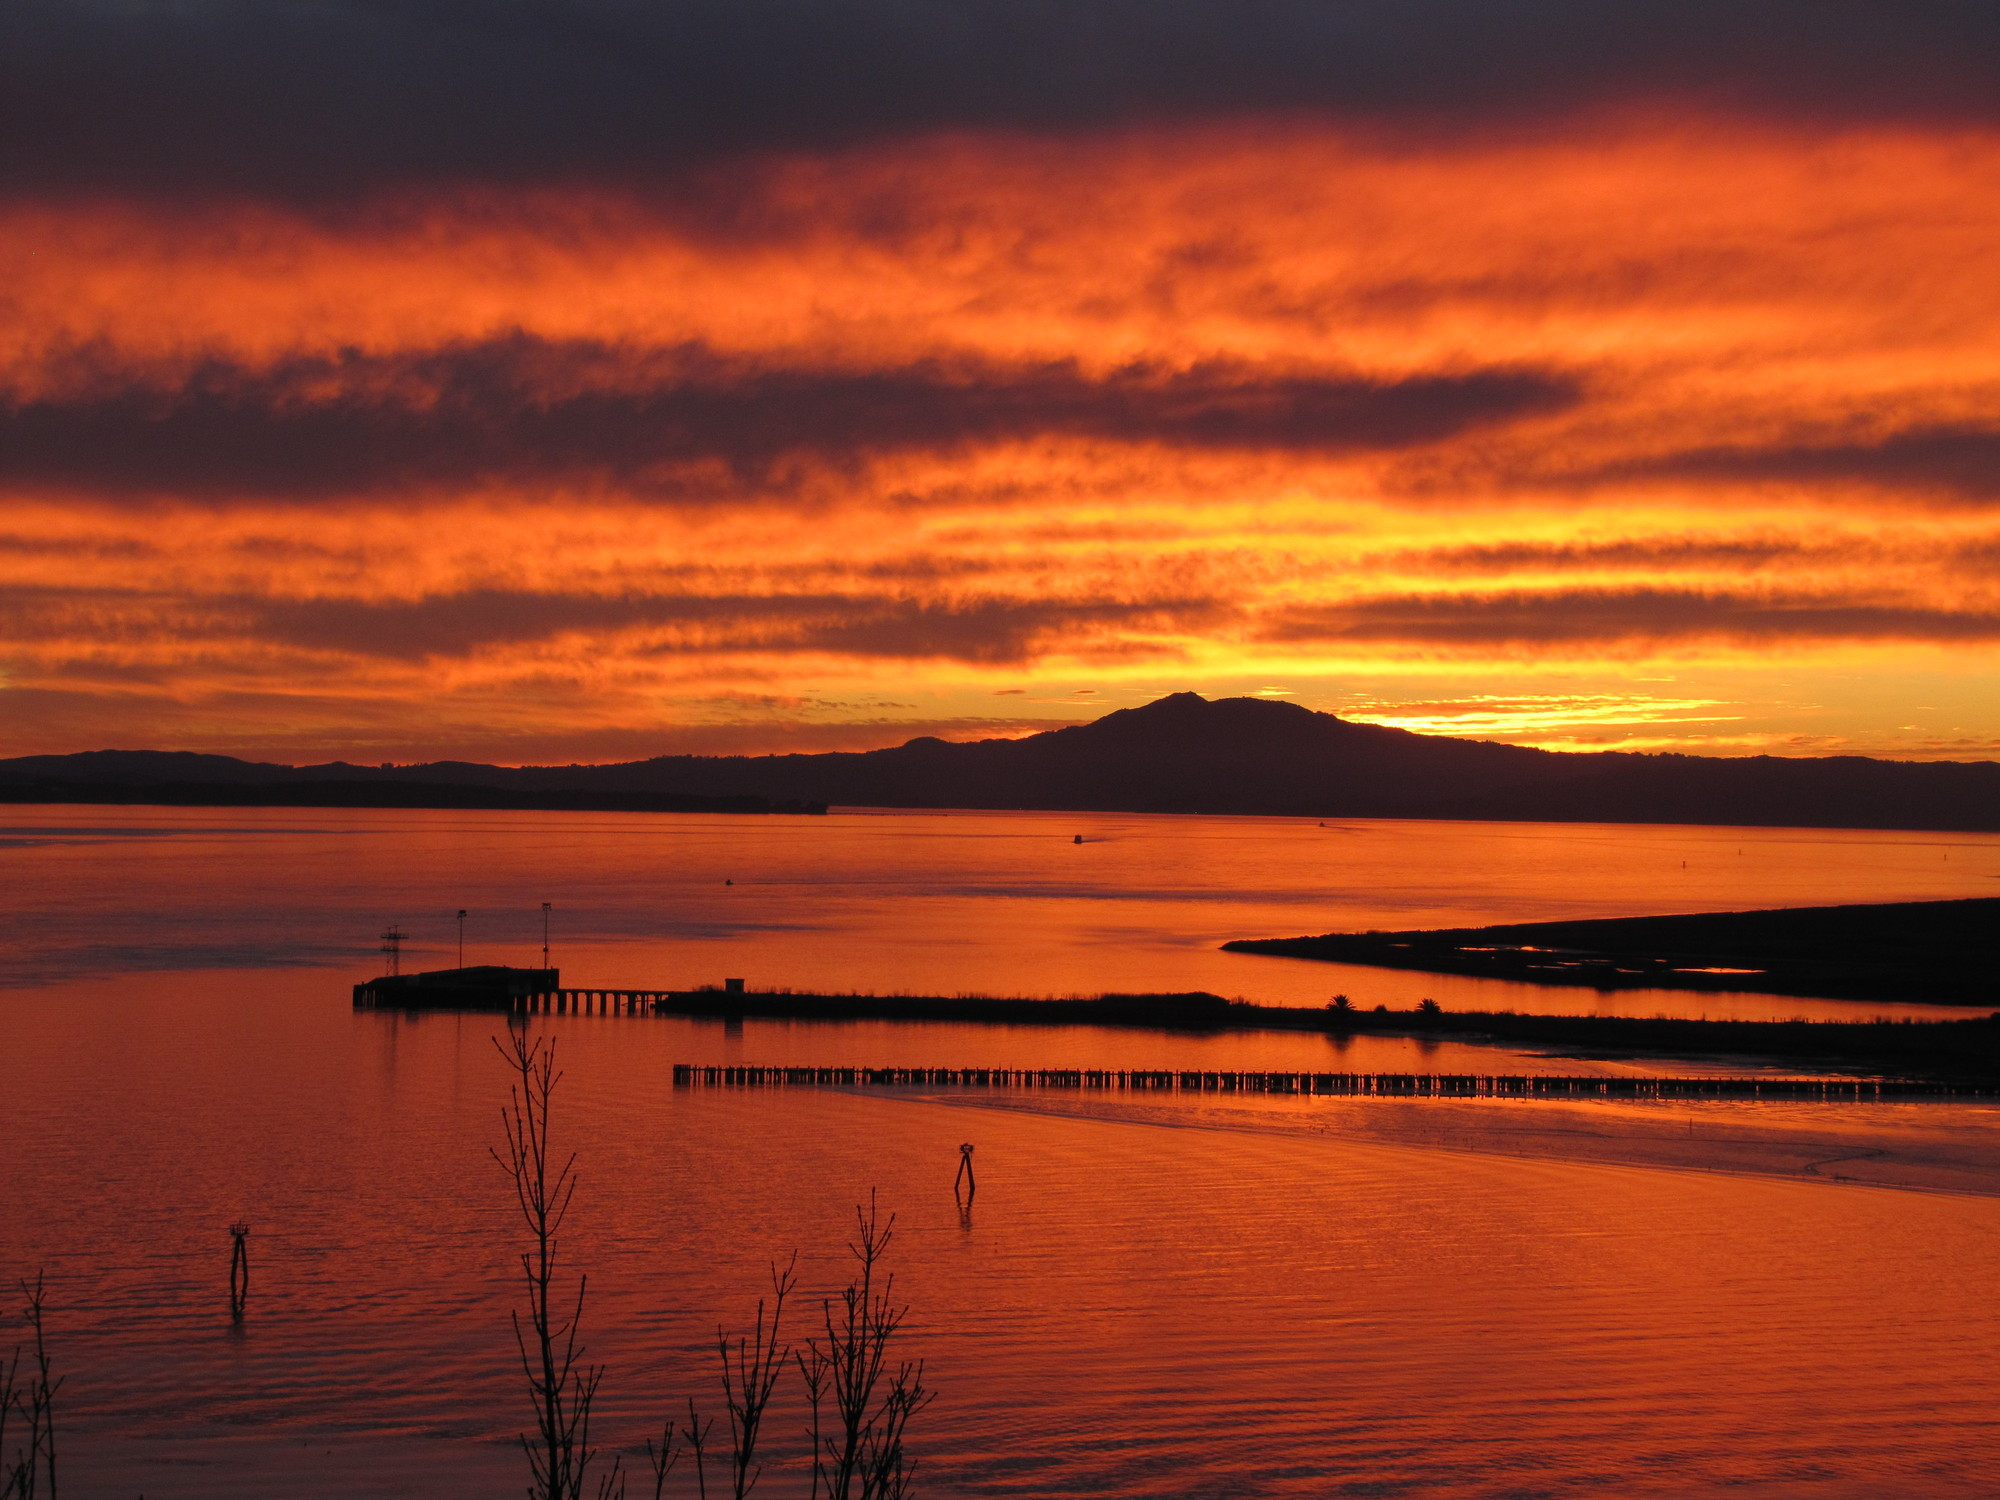 Mount Tamalpais-San Pablo Bay